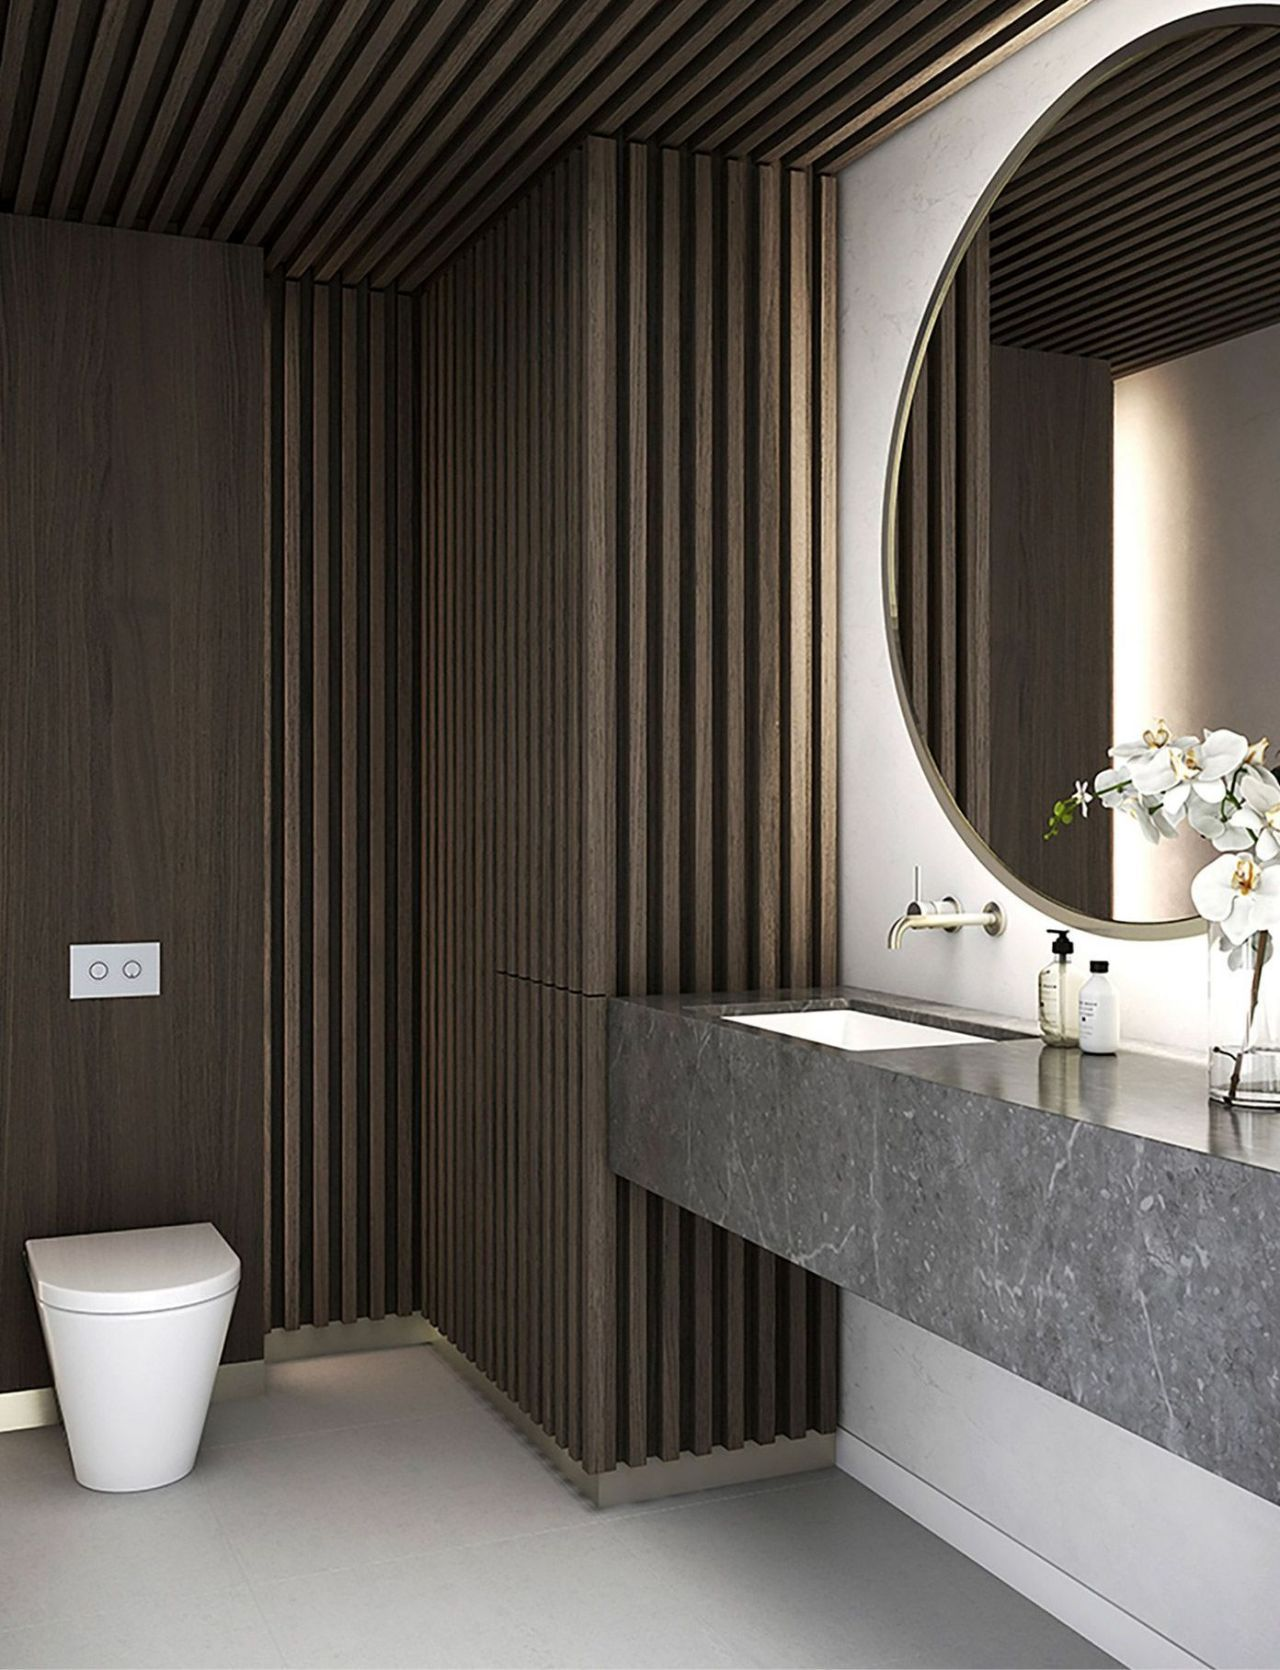 100 Great Minimalist Modern Bathroom Ideas 63 With Images Luxury Powder Room Modern Powder Rooms Powder Room Design